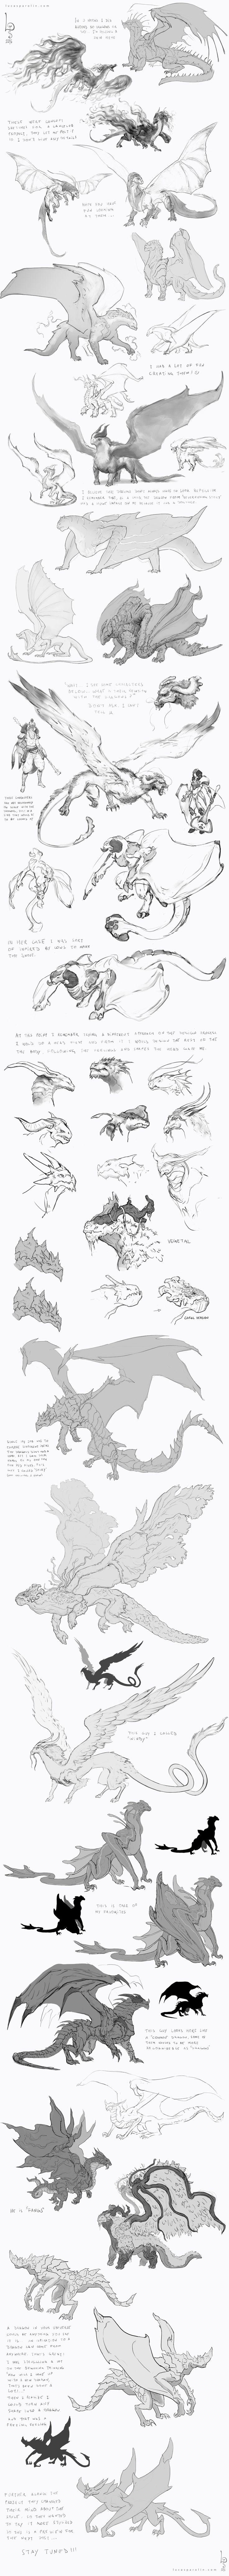 ArtStation - Concept Sketches - Dragons, Lucas Parolin